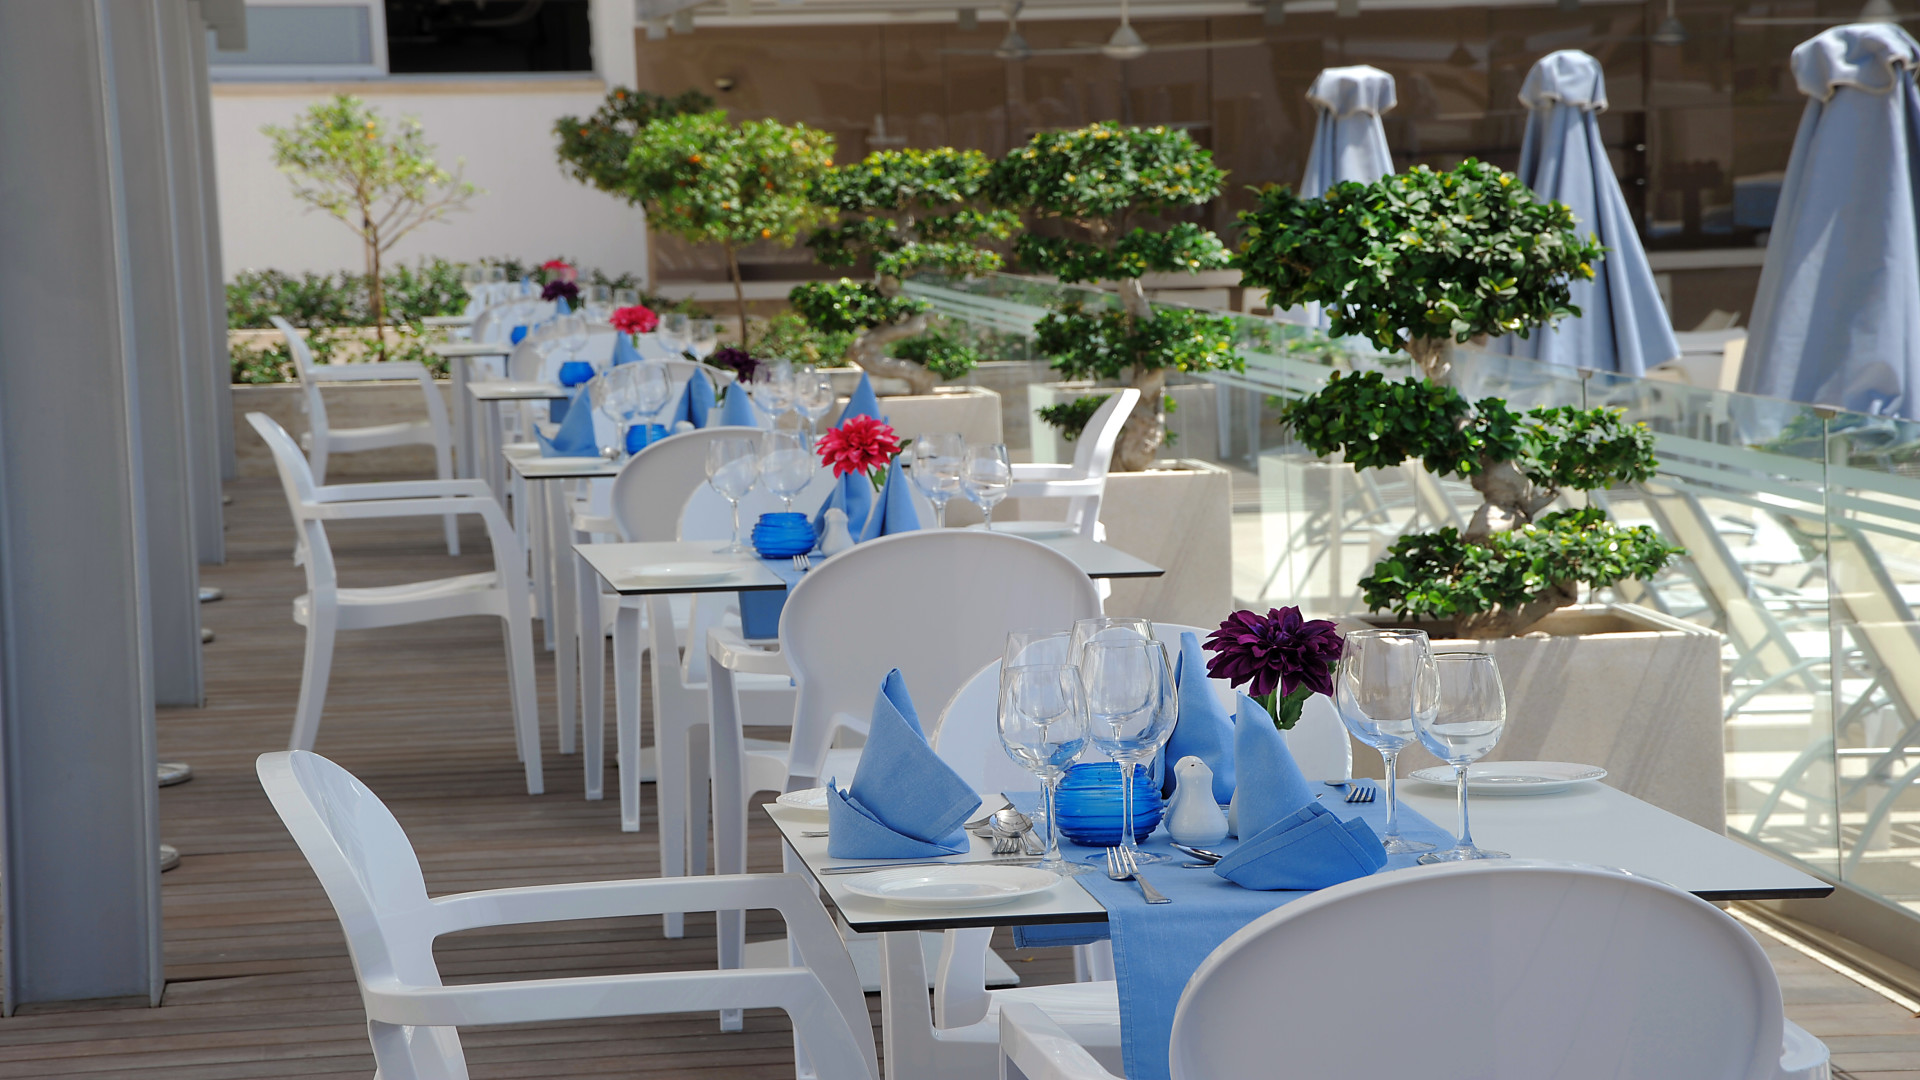 Terras à la carte restaurant Thetis, hotel Nestor, Ayia Napa, Cyprus